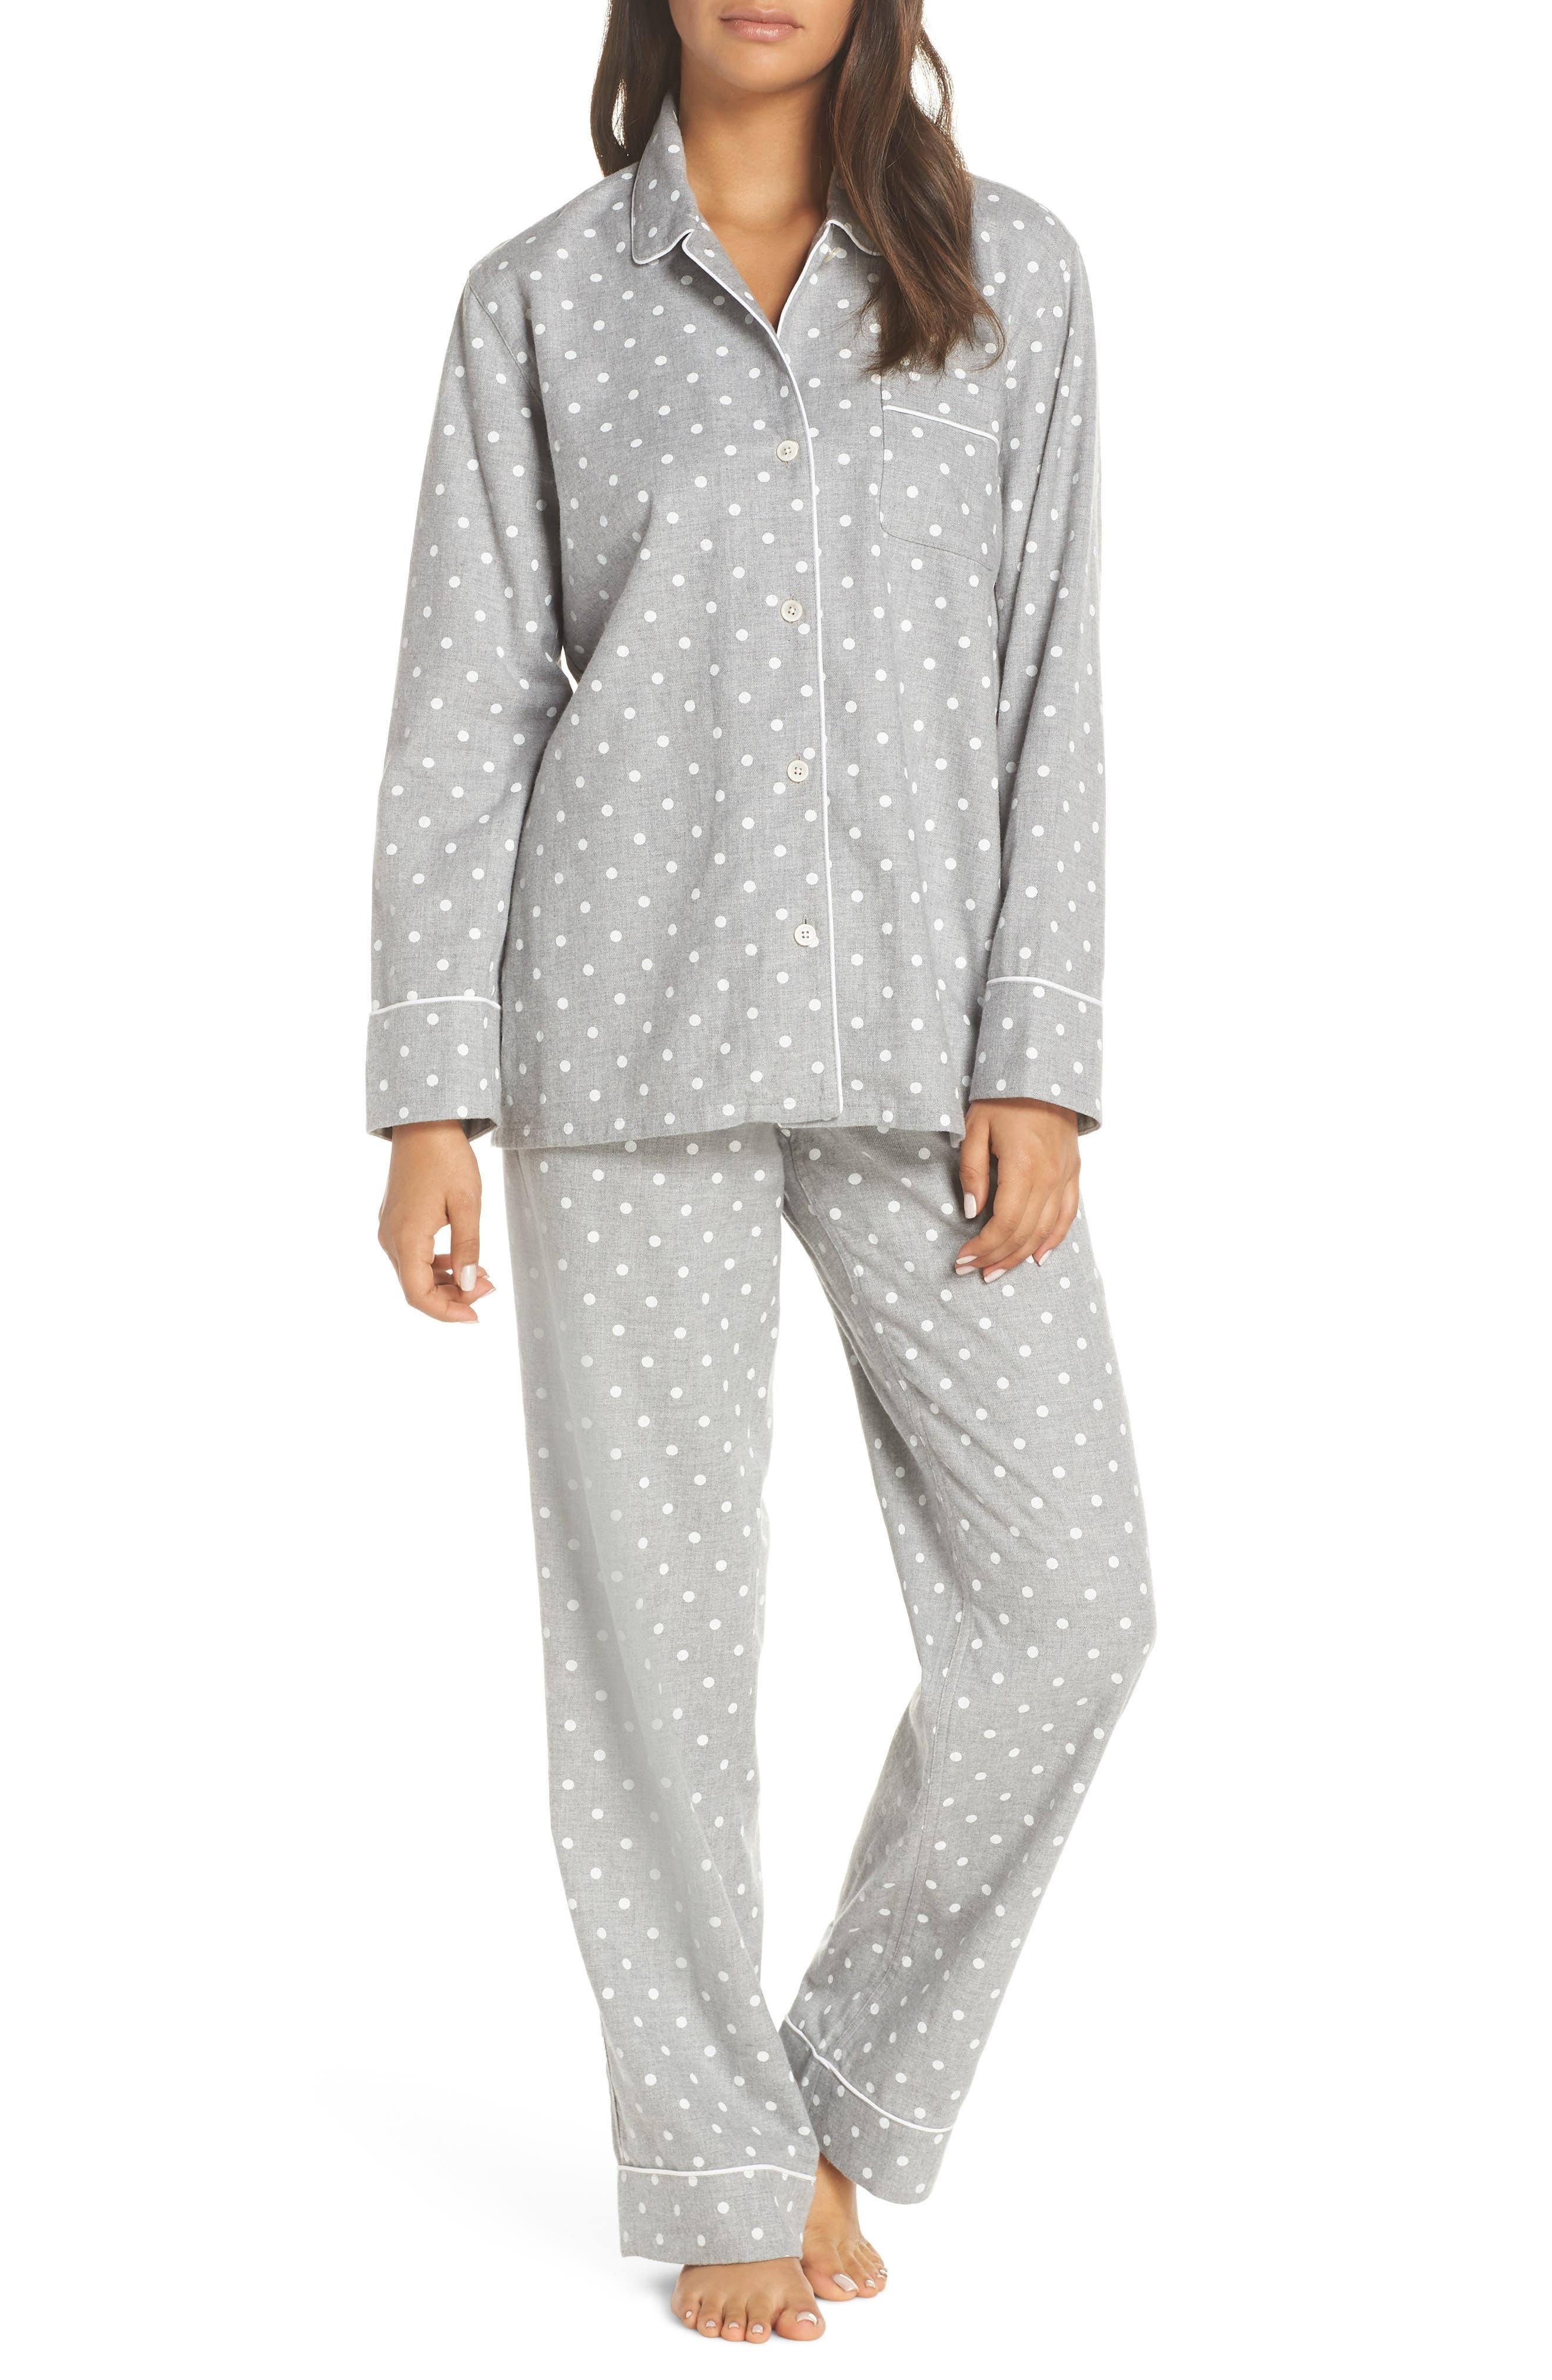 Flannel Pajamas,                             Main thumbnail 1, color,                             023